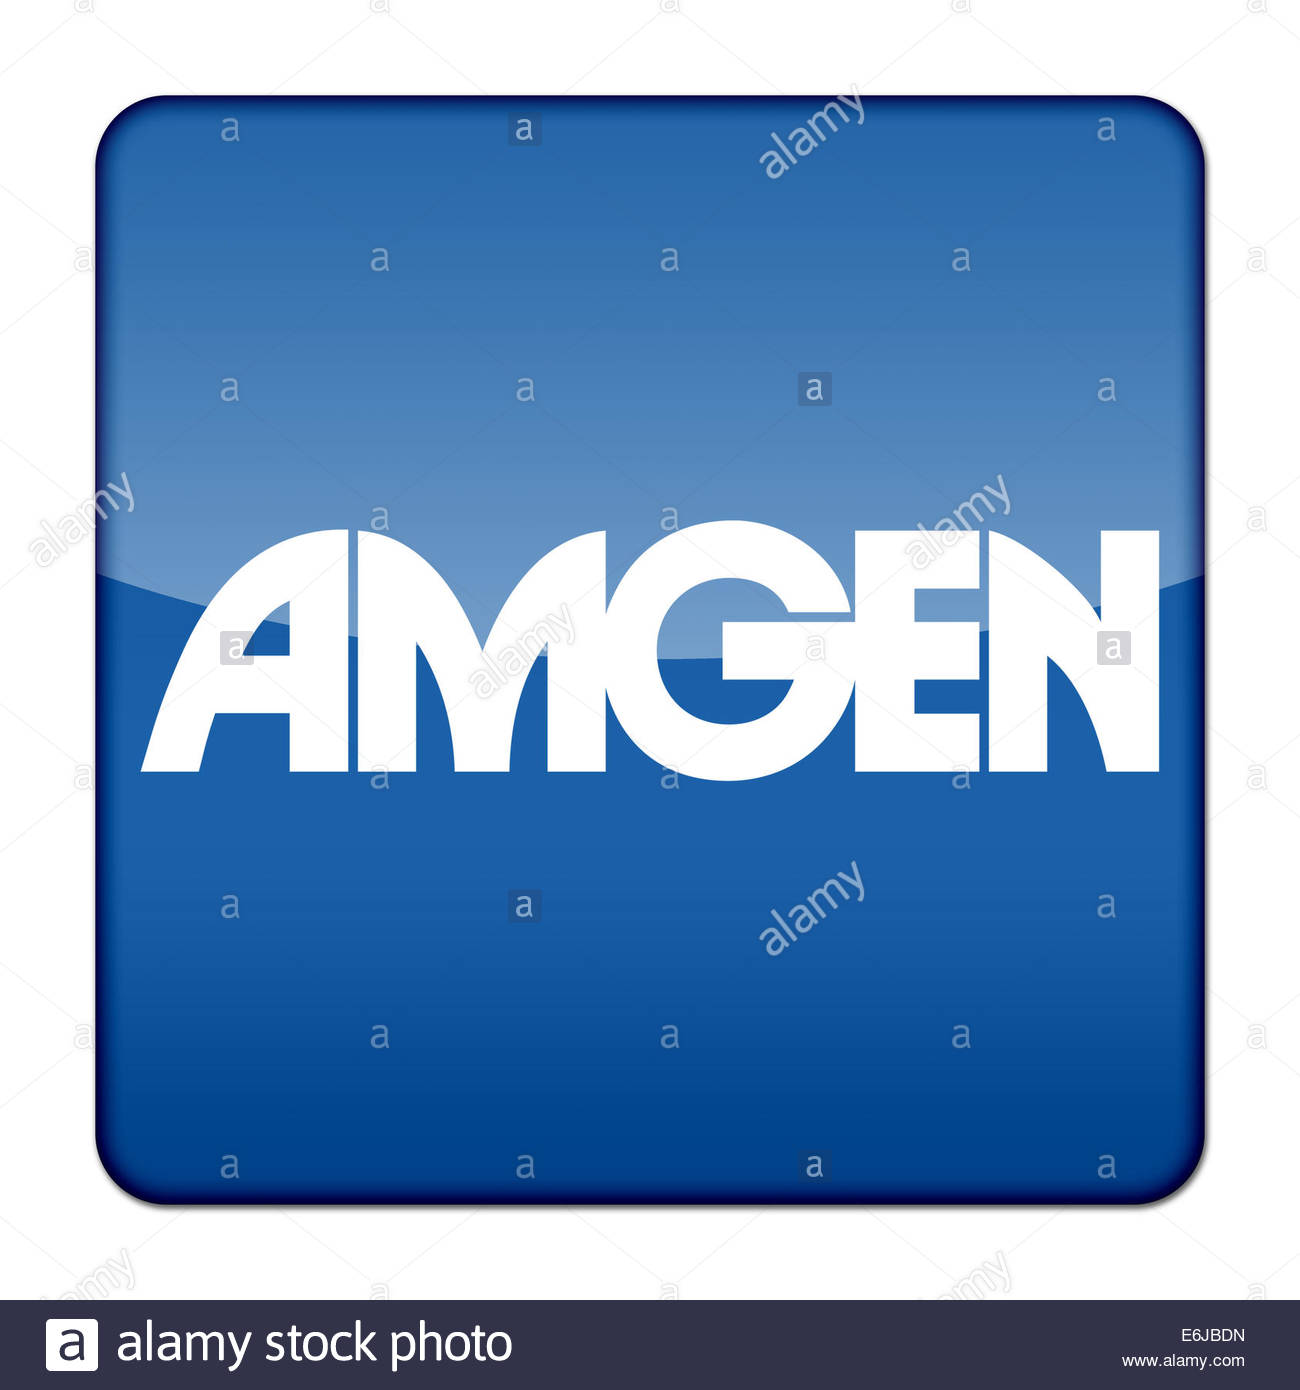 Amgen logo icon isolated app button Stock Photo: 72933553